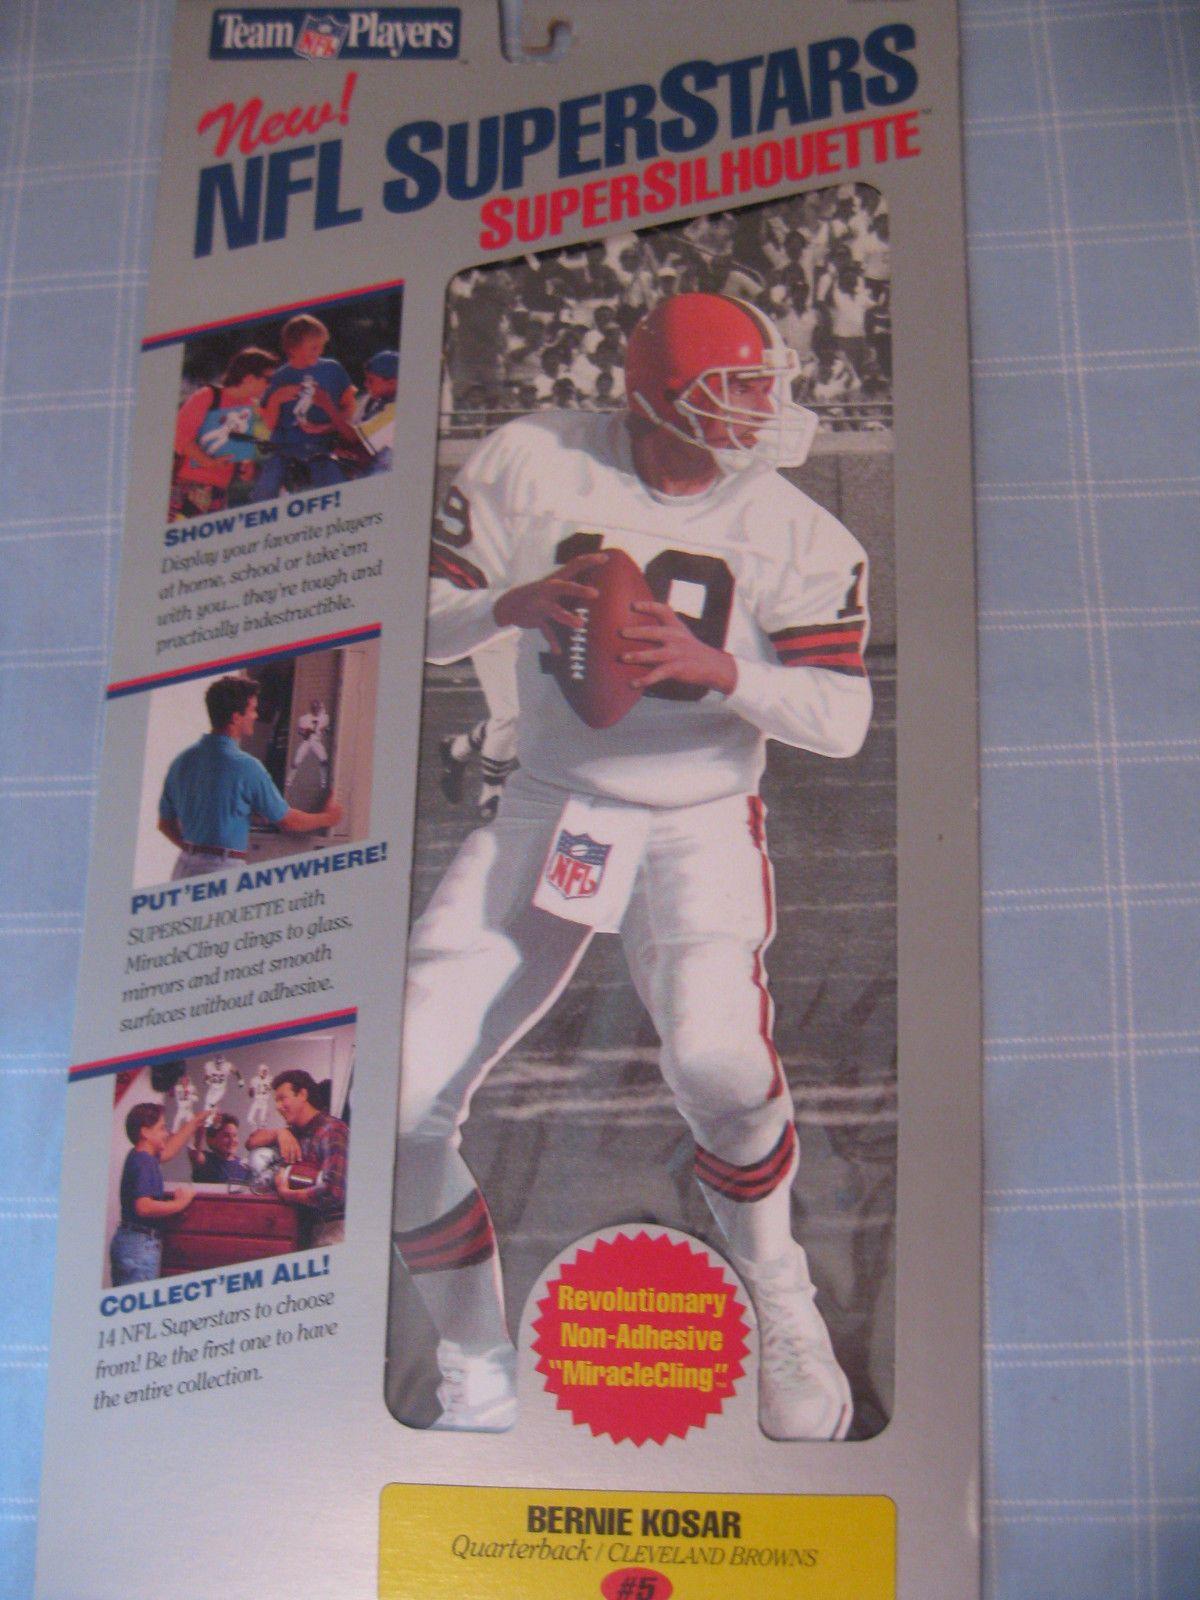 BERNIE KOSAR SUPER SILHOUETTE VINTAGE PRE FATHEAD NFL LEGEND NEW SEALED PACKAGE